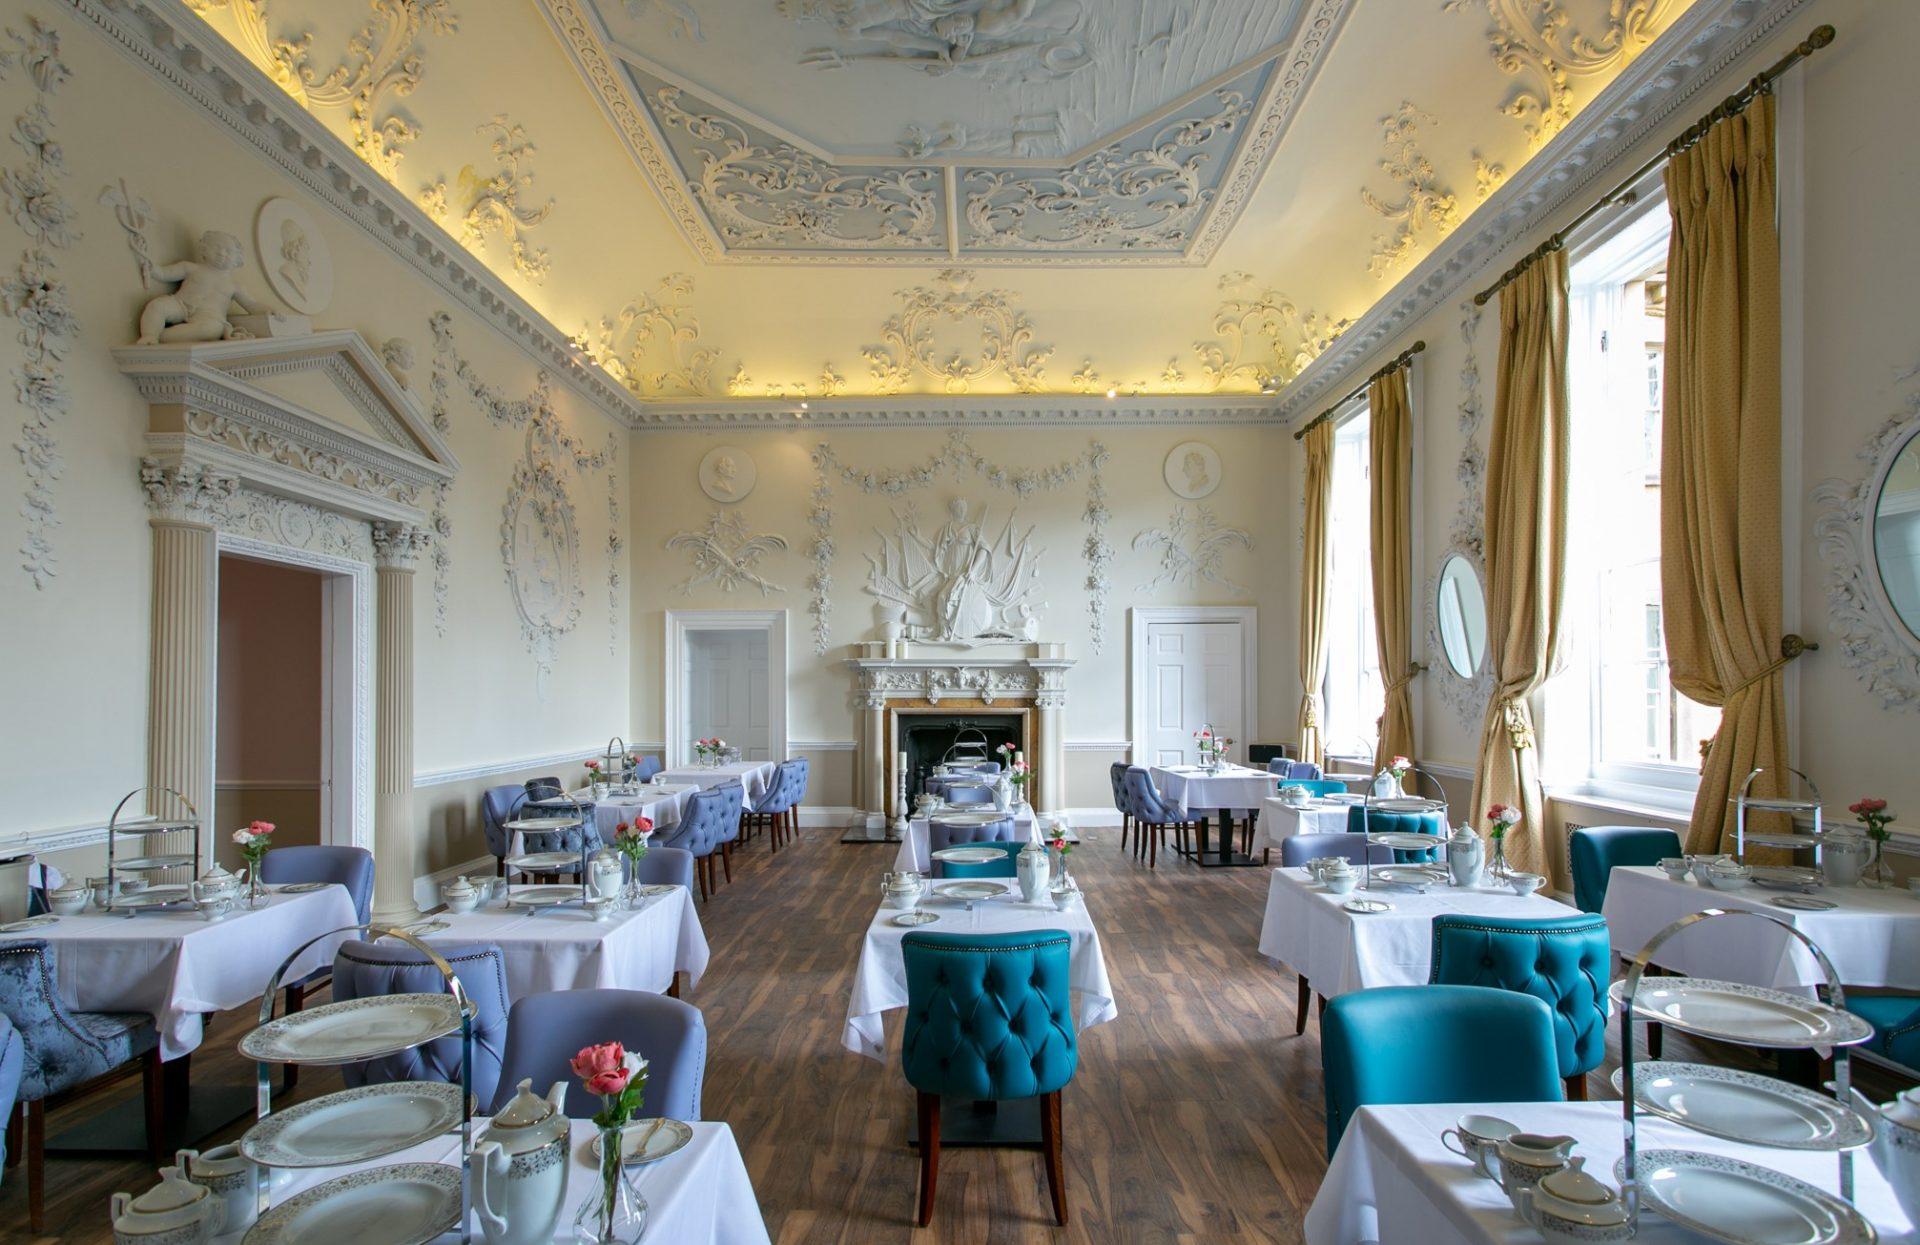 The Grand Salon at Alibi Bar and Restaurant